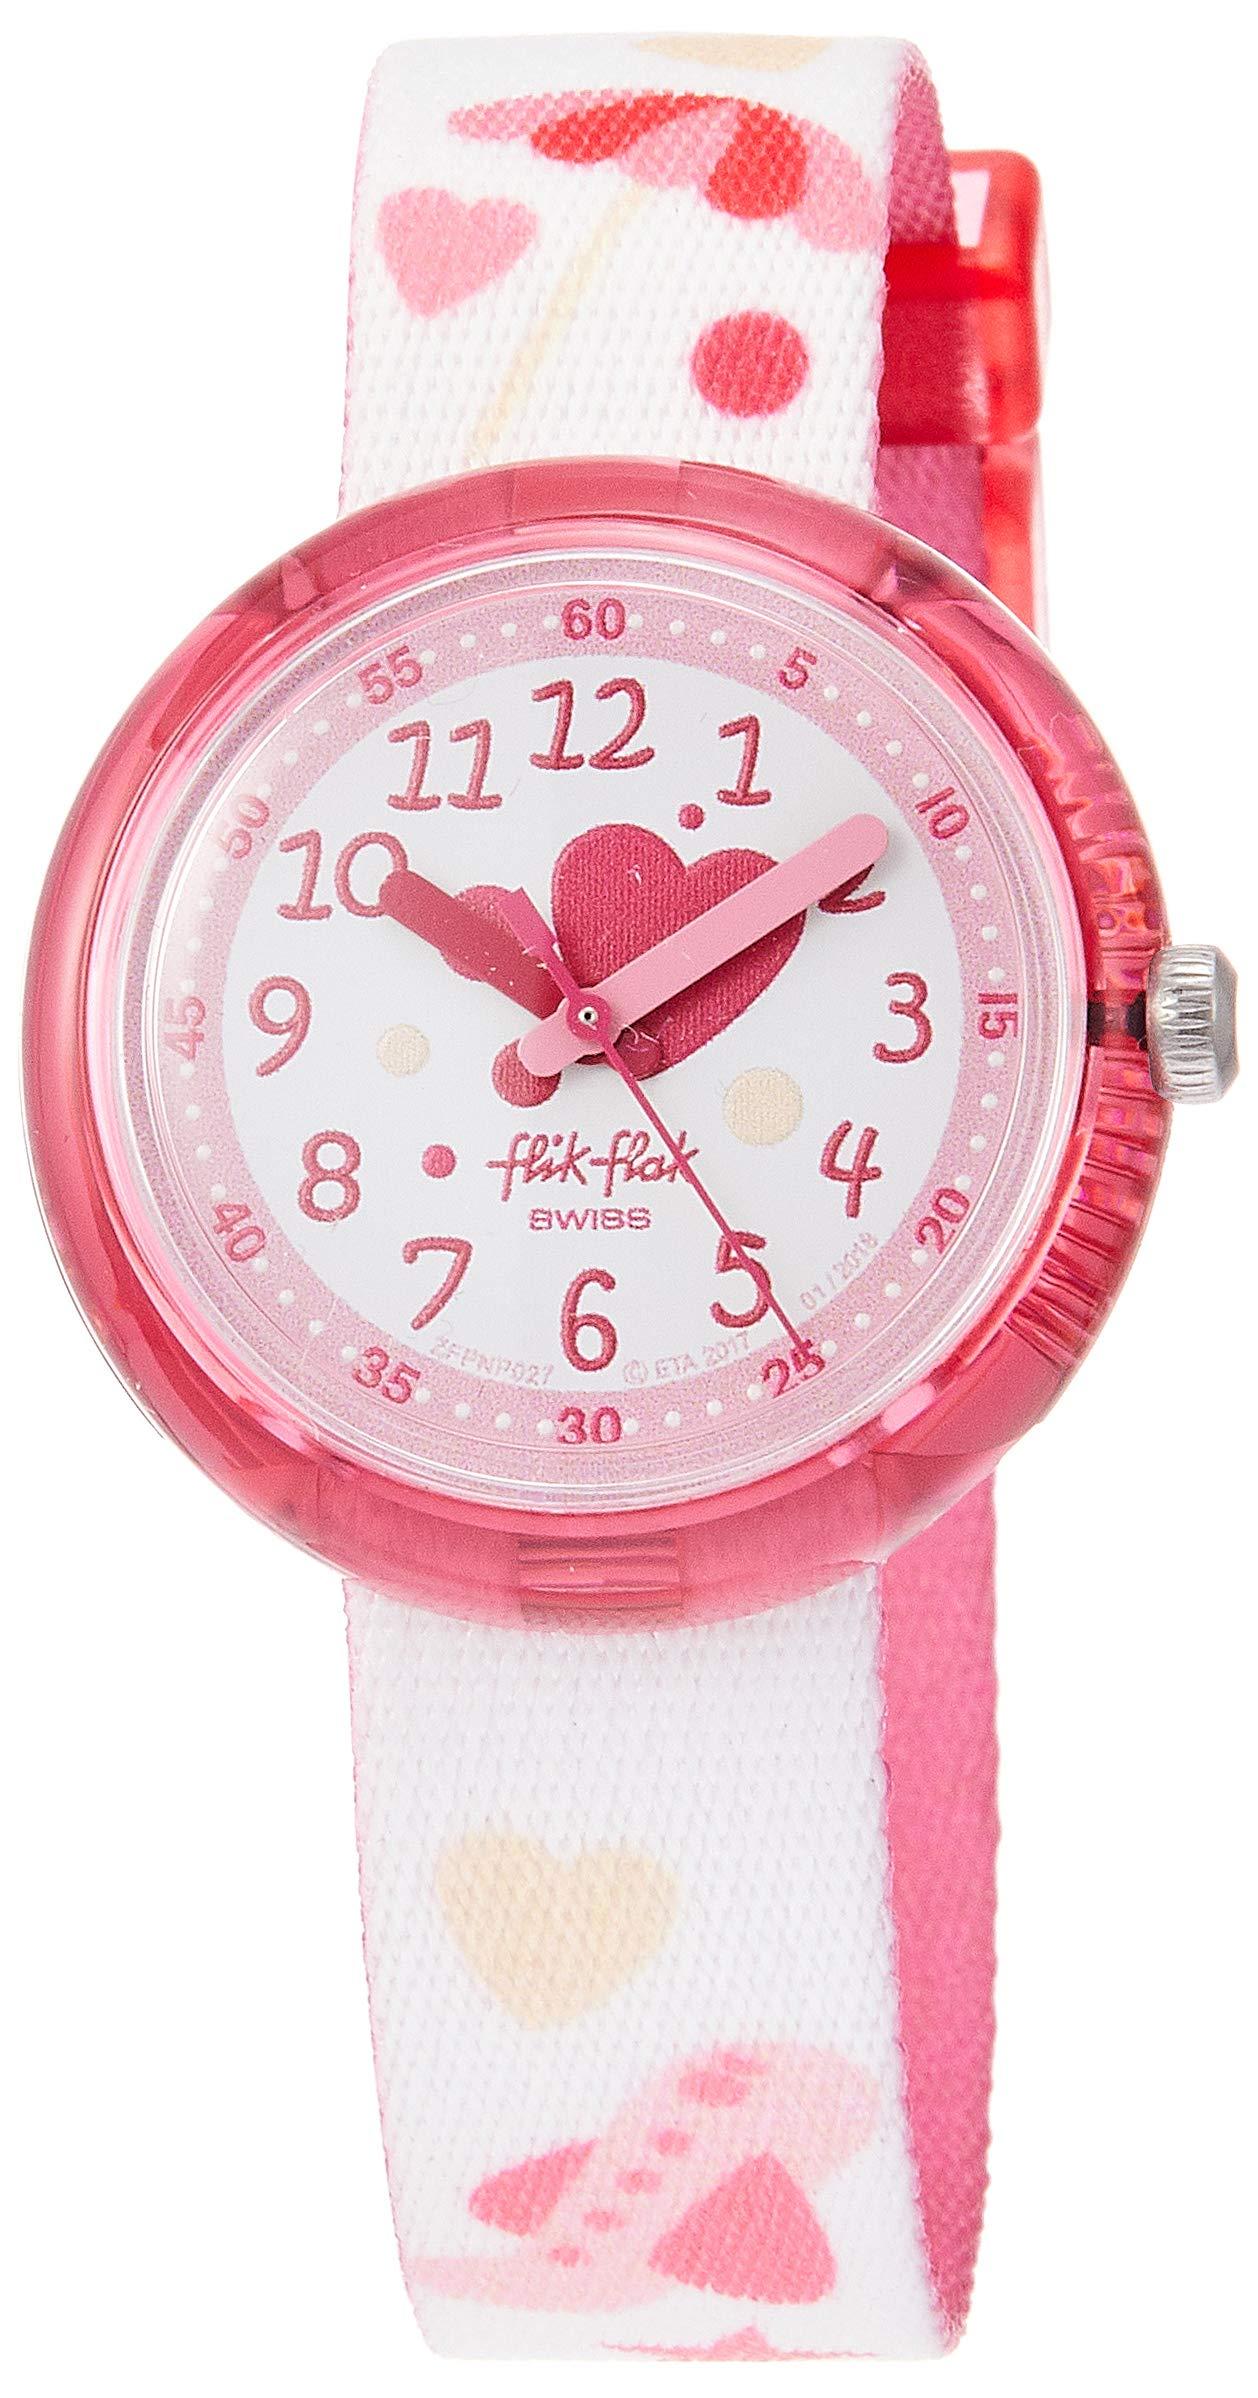 Flik Flak Kids' Quartz Nylon Strap, Pink, 14 Casual Watch (Model: ZFPNP027) by Flik Flak